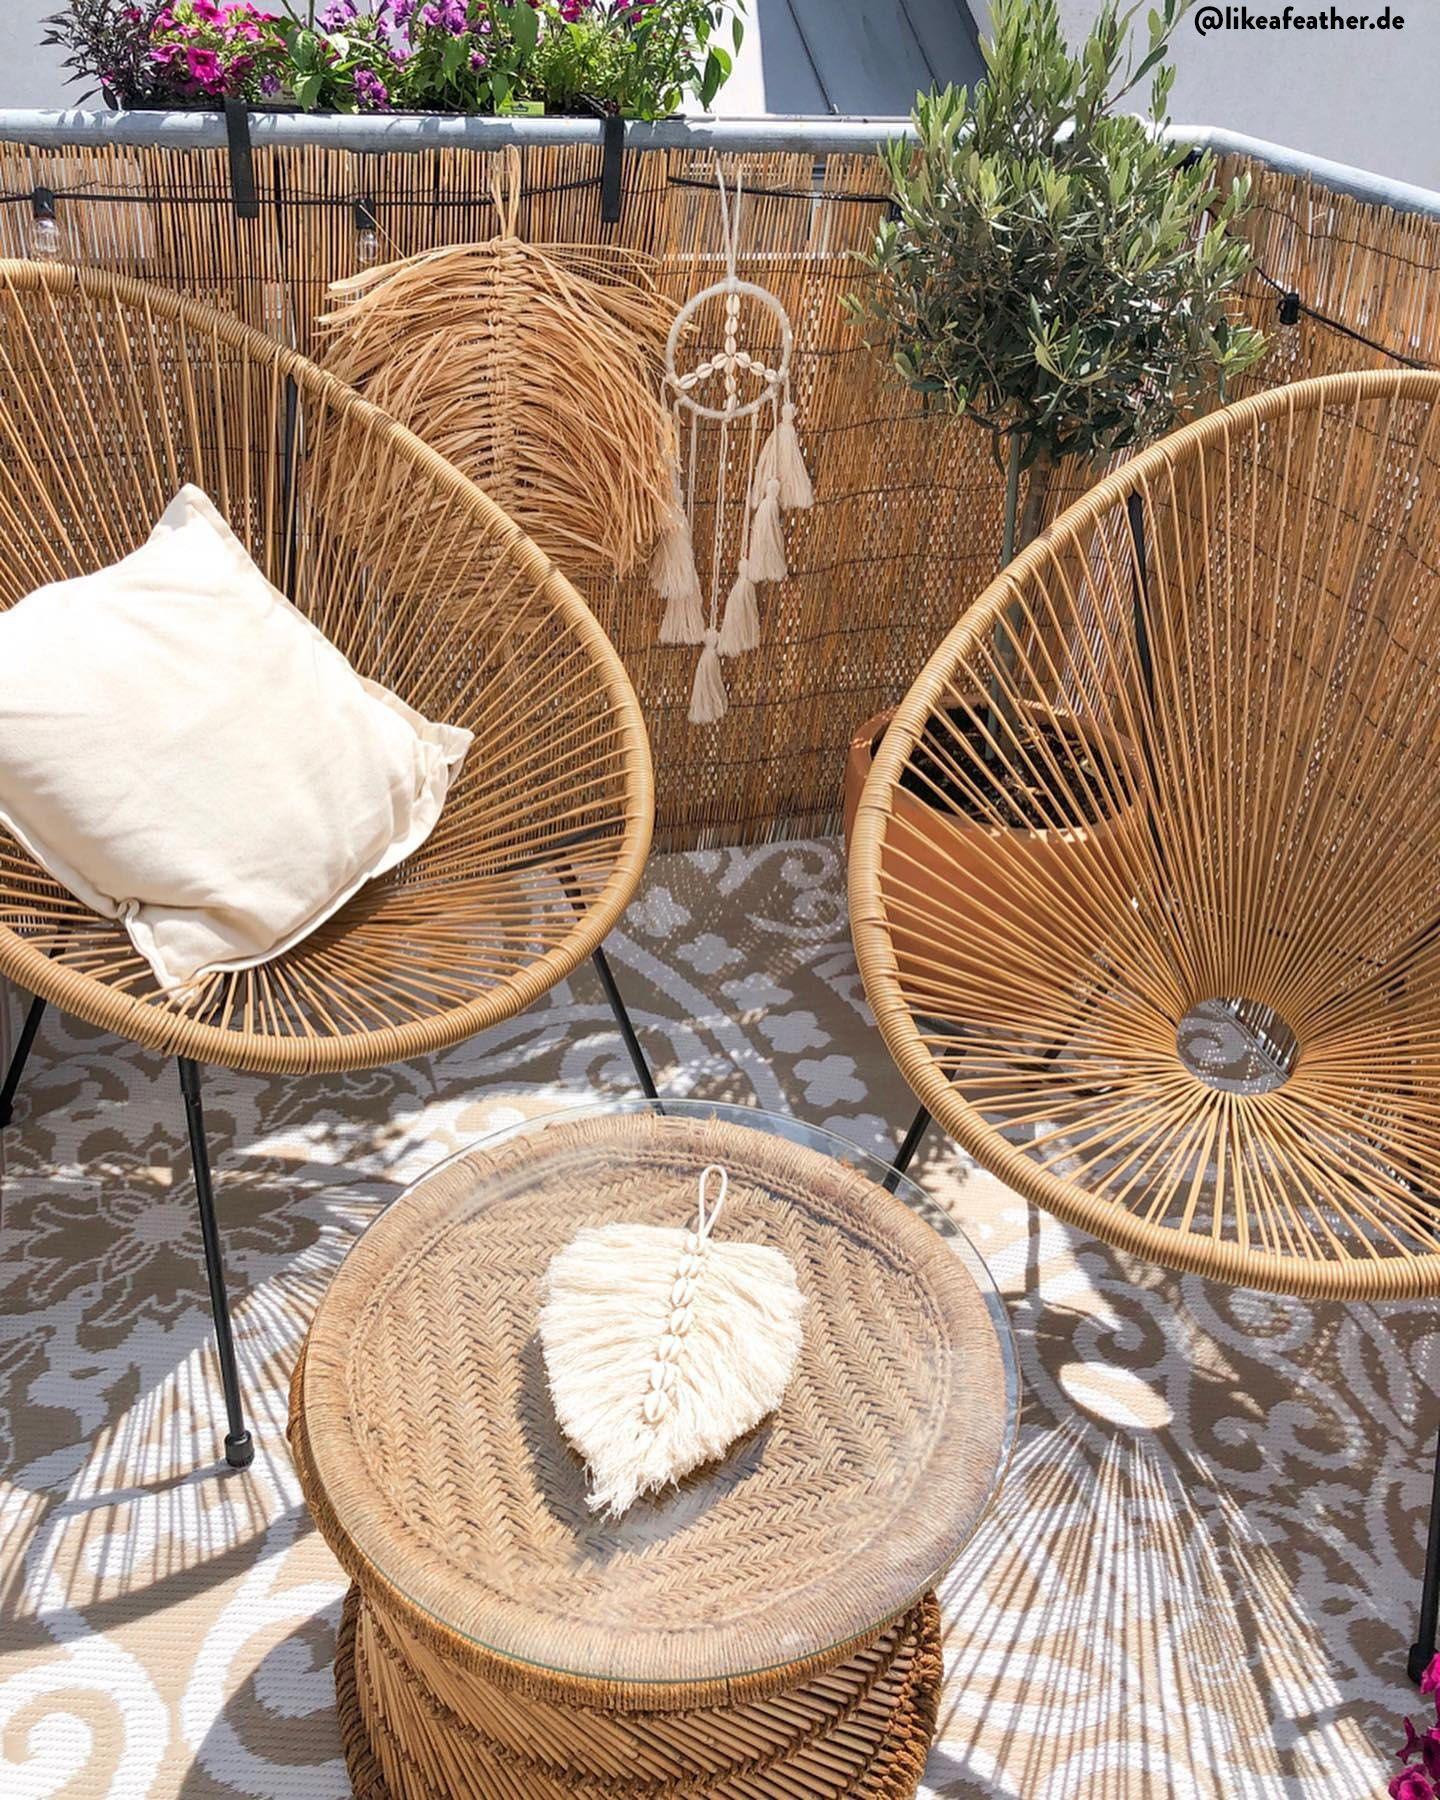 Loungesessel Bahia Aus Kunststoff Geflecht Westwingnow Lounge Sessel Diy Deko Schlafzimmer Lounge Sessel Outdoor